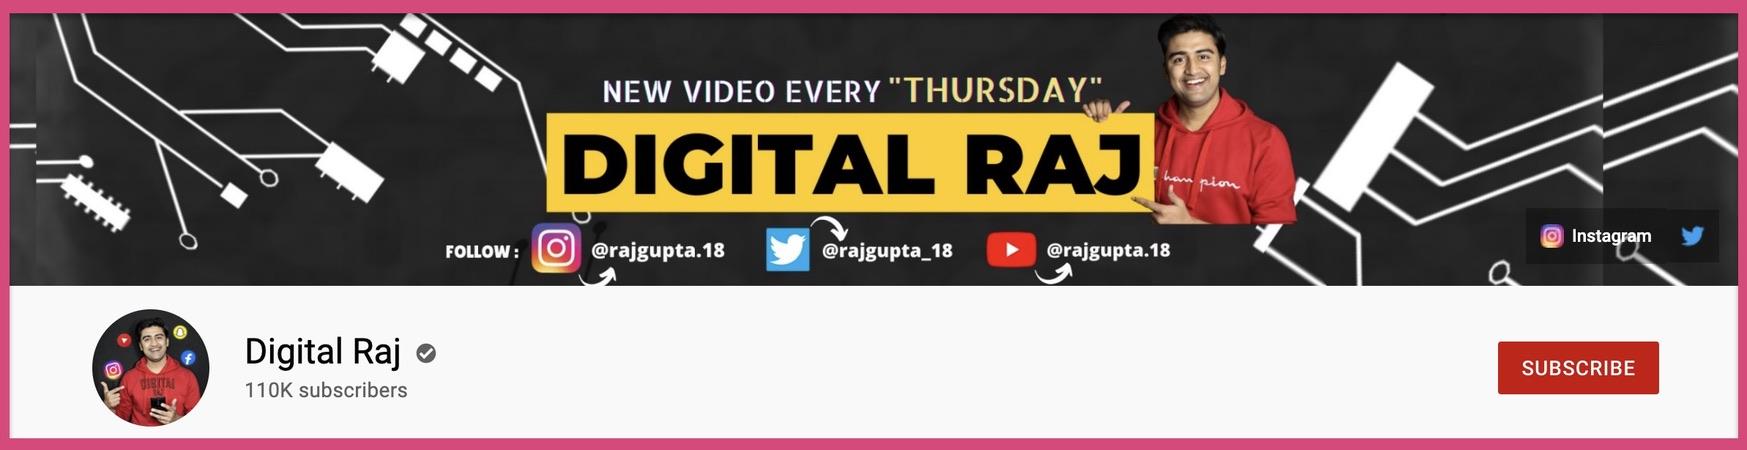 Digital Raj's 2560 x 1440 pixels YouTube banner